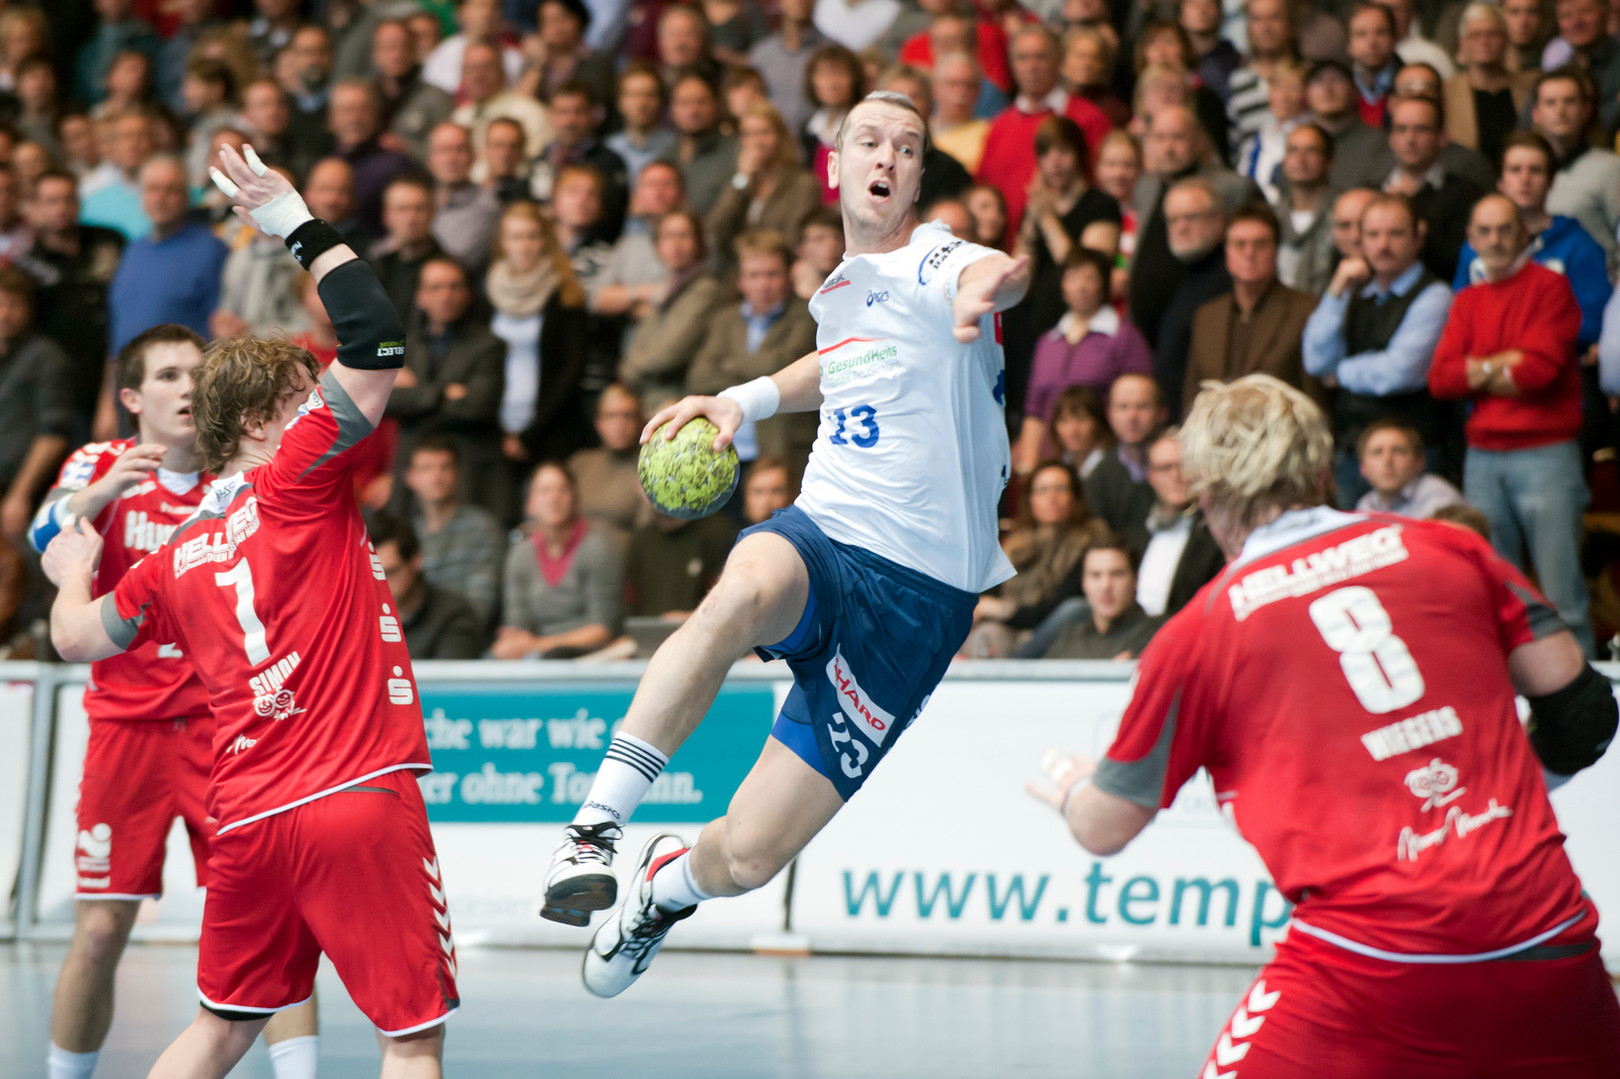 HSV HAMBURG HANDBALL - PASCAL HENS